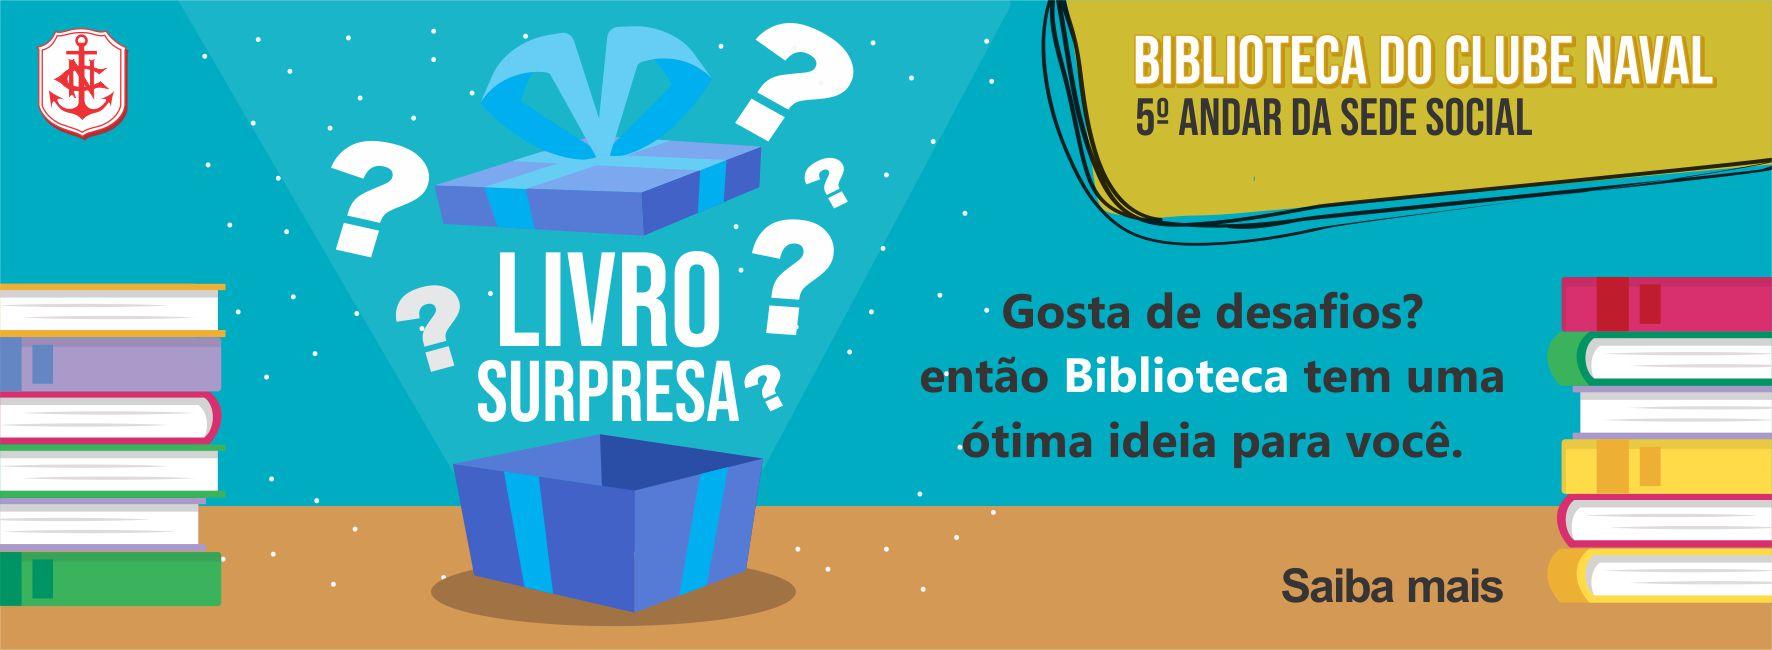 https://www.clubenaval.org.br/novo/desafio-do-livro-surpresa-2019